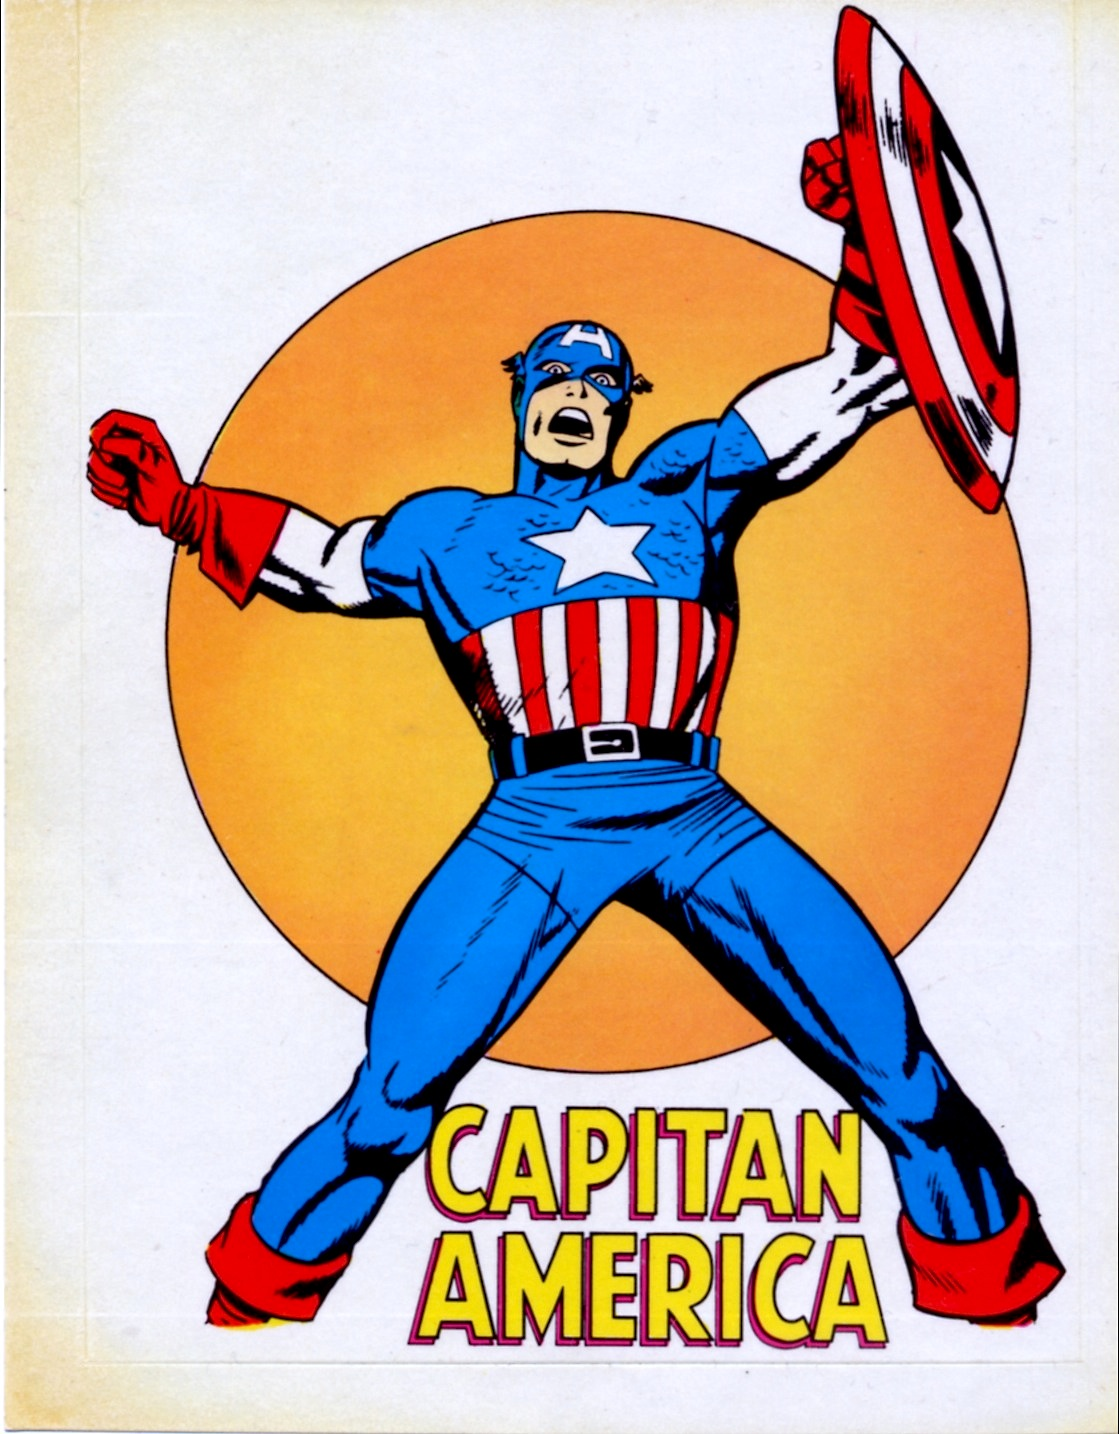 Capitan_america_adesivo-1